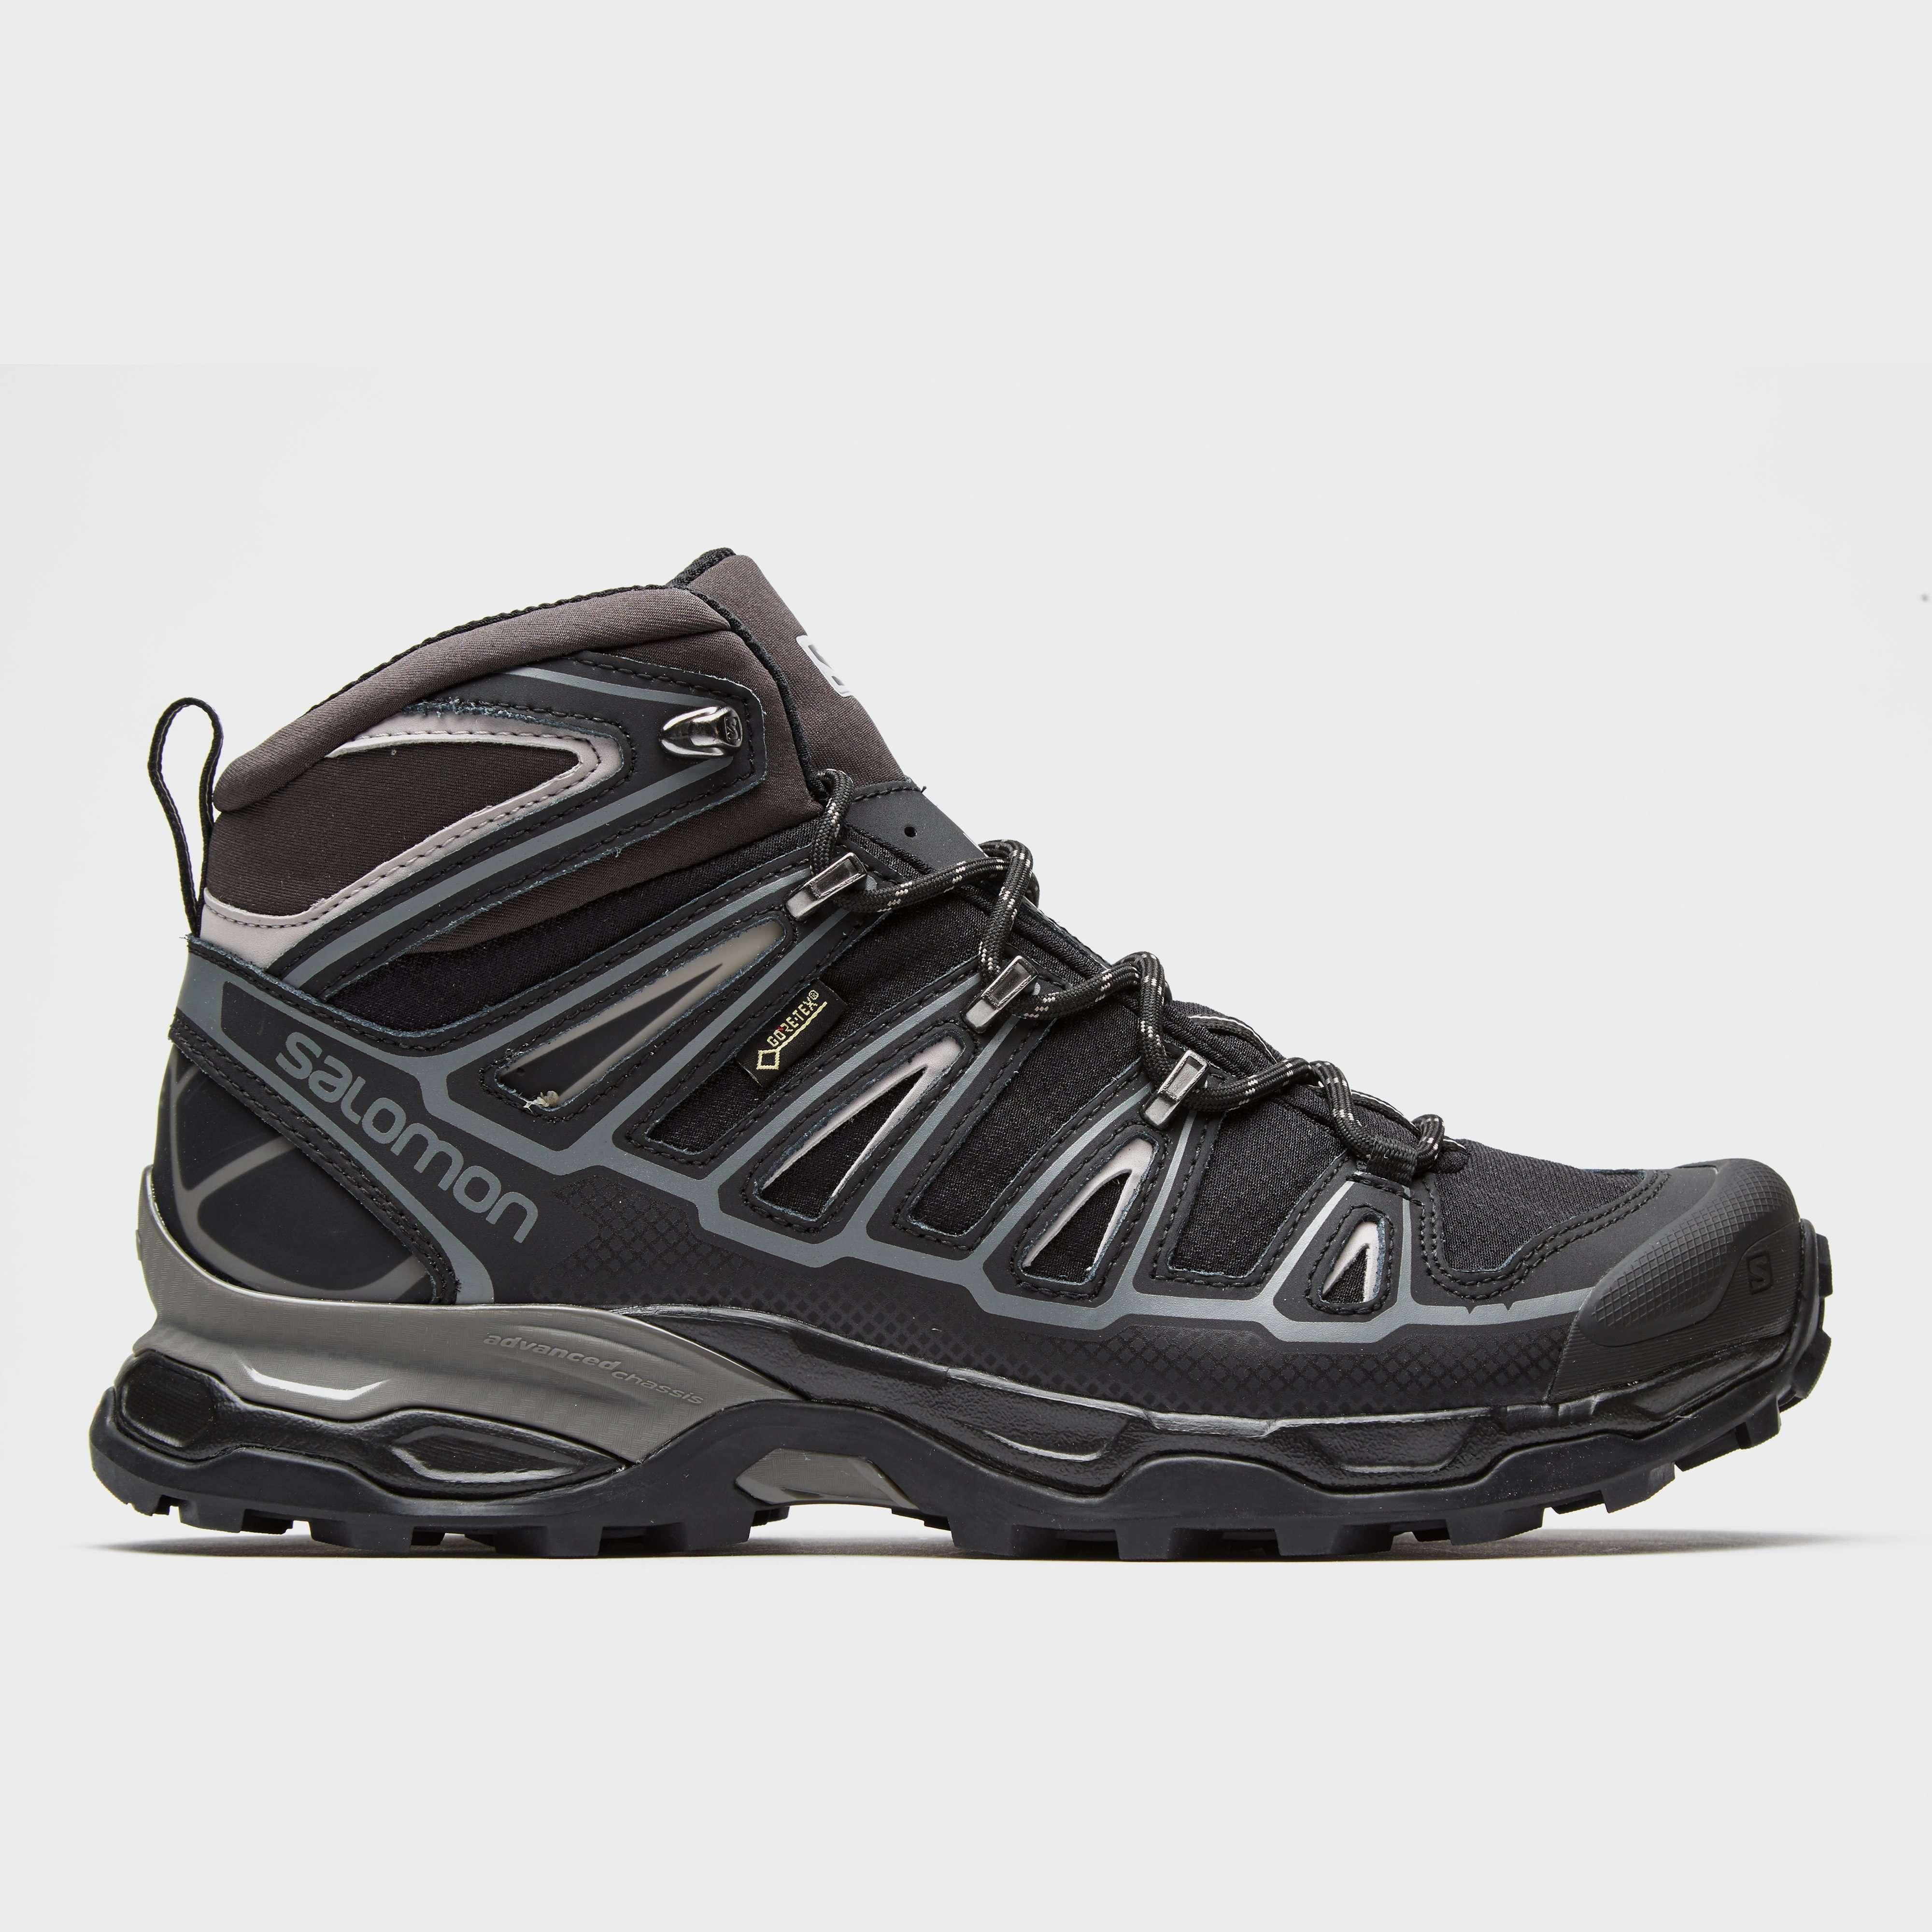 SALOMON Men's Ultra 2 GORE-TEX® Cross Terrain Mid Shoe